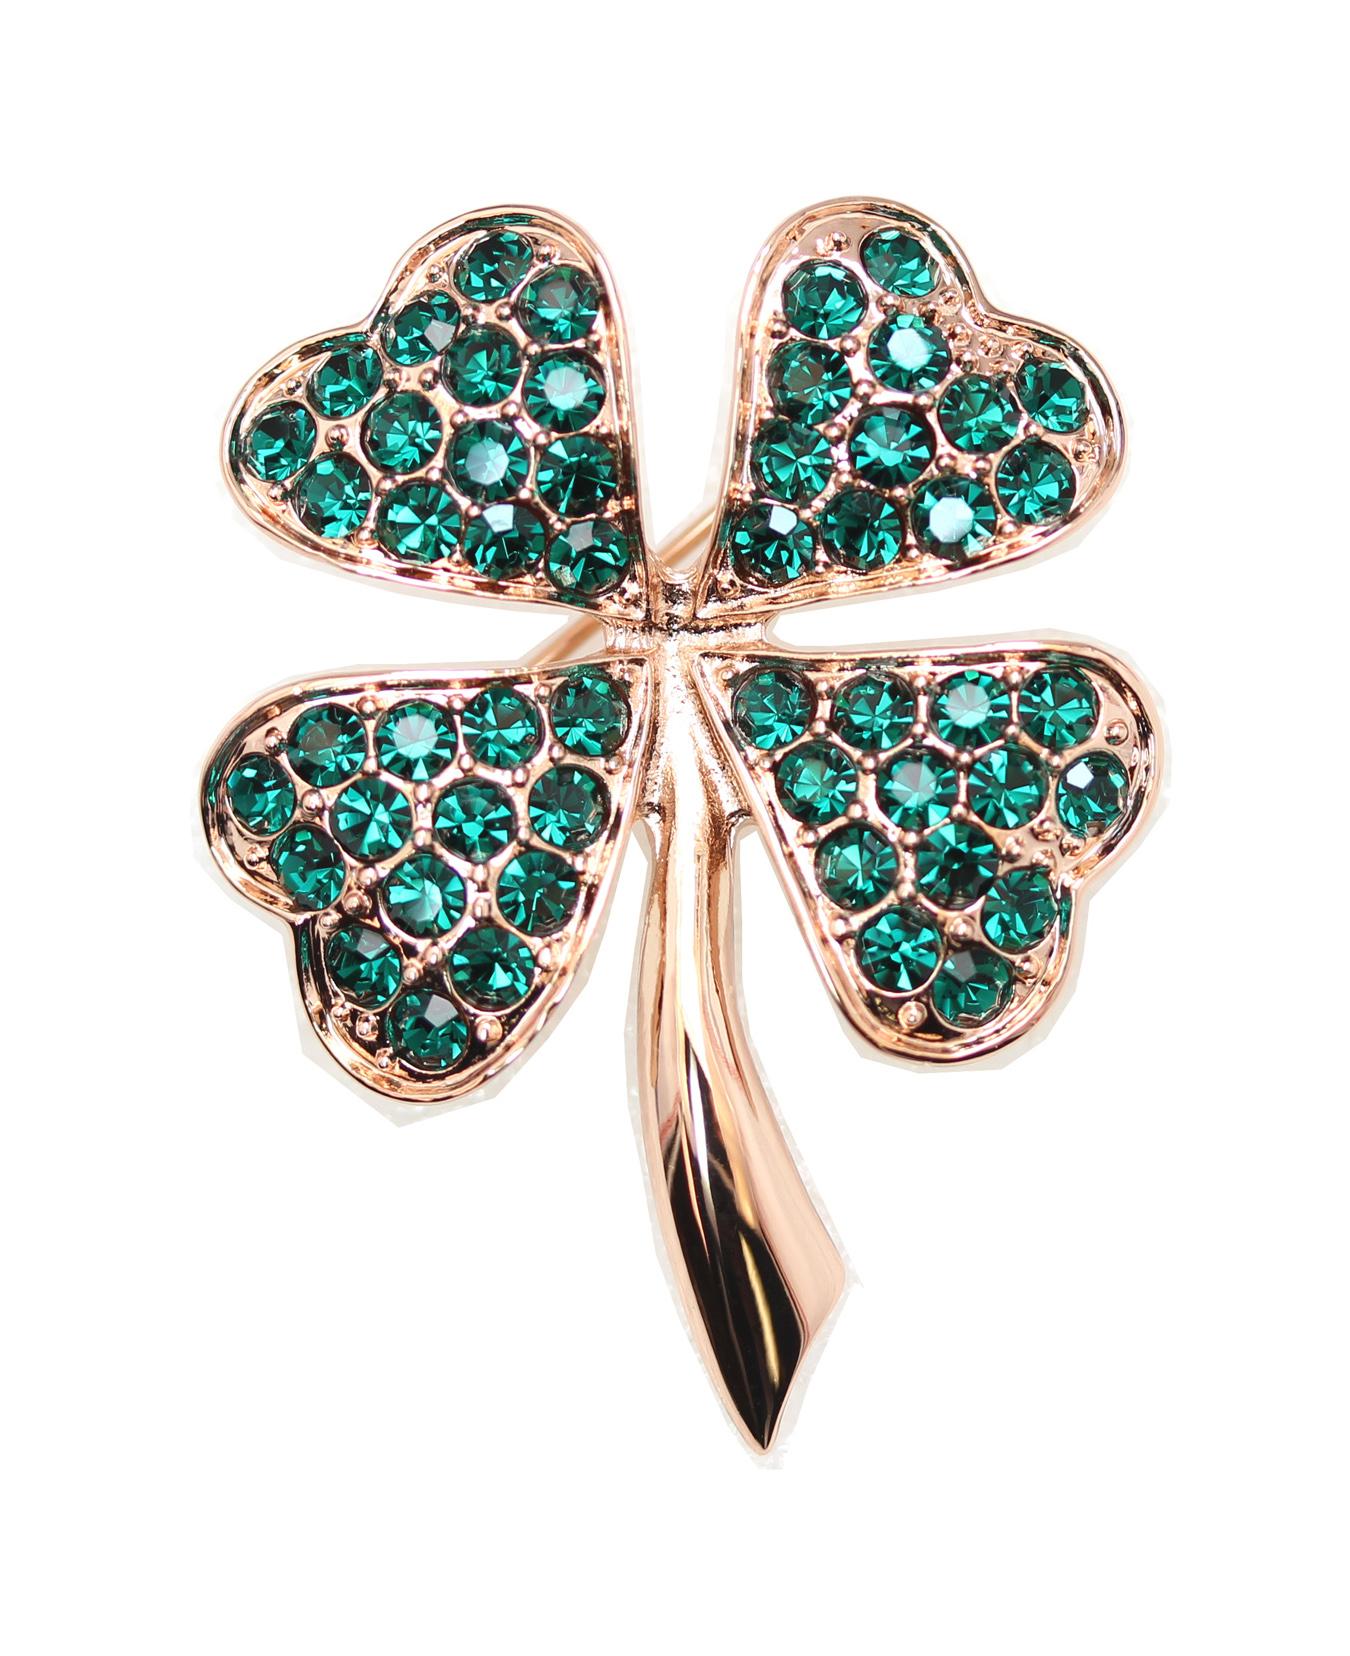 Faship Gorgeous Green Shamrock Clover Leaf Pin Brooch